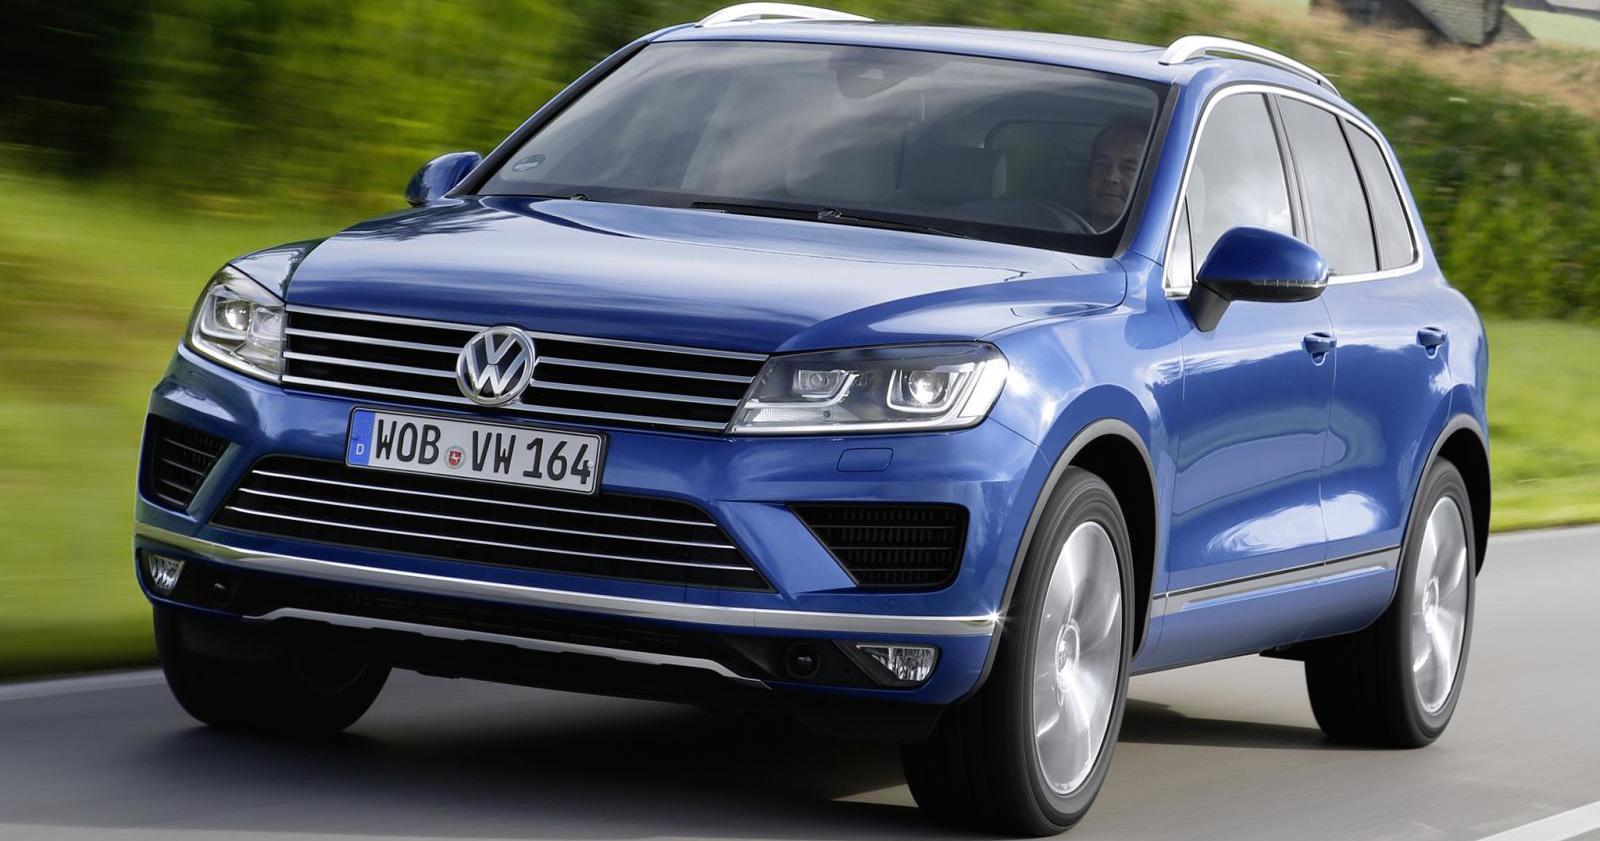 2015 volkswagen touareg power efficiency boosts for 3 0 litre v6 tdi photos caradvice. Black Bedroom Furniture Sets. Home Design Ideas